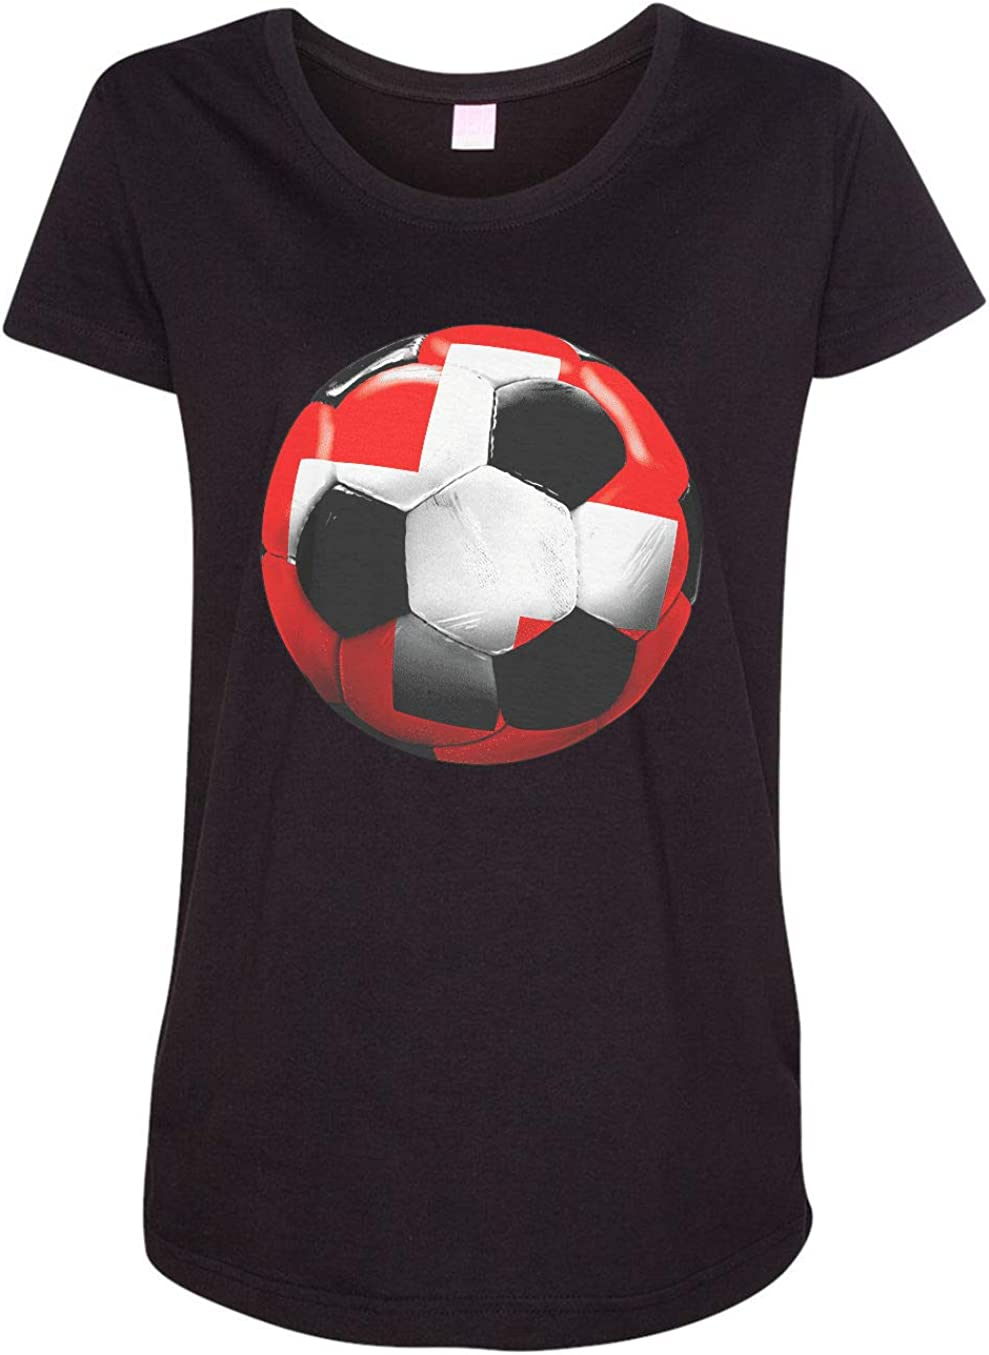 HARD EDGE DESIGN Women's Switzerland Soccer T-Shirt